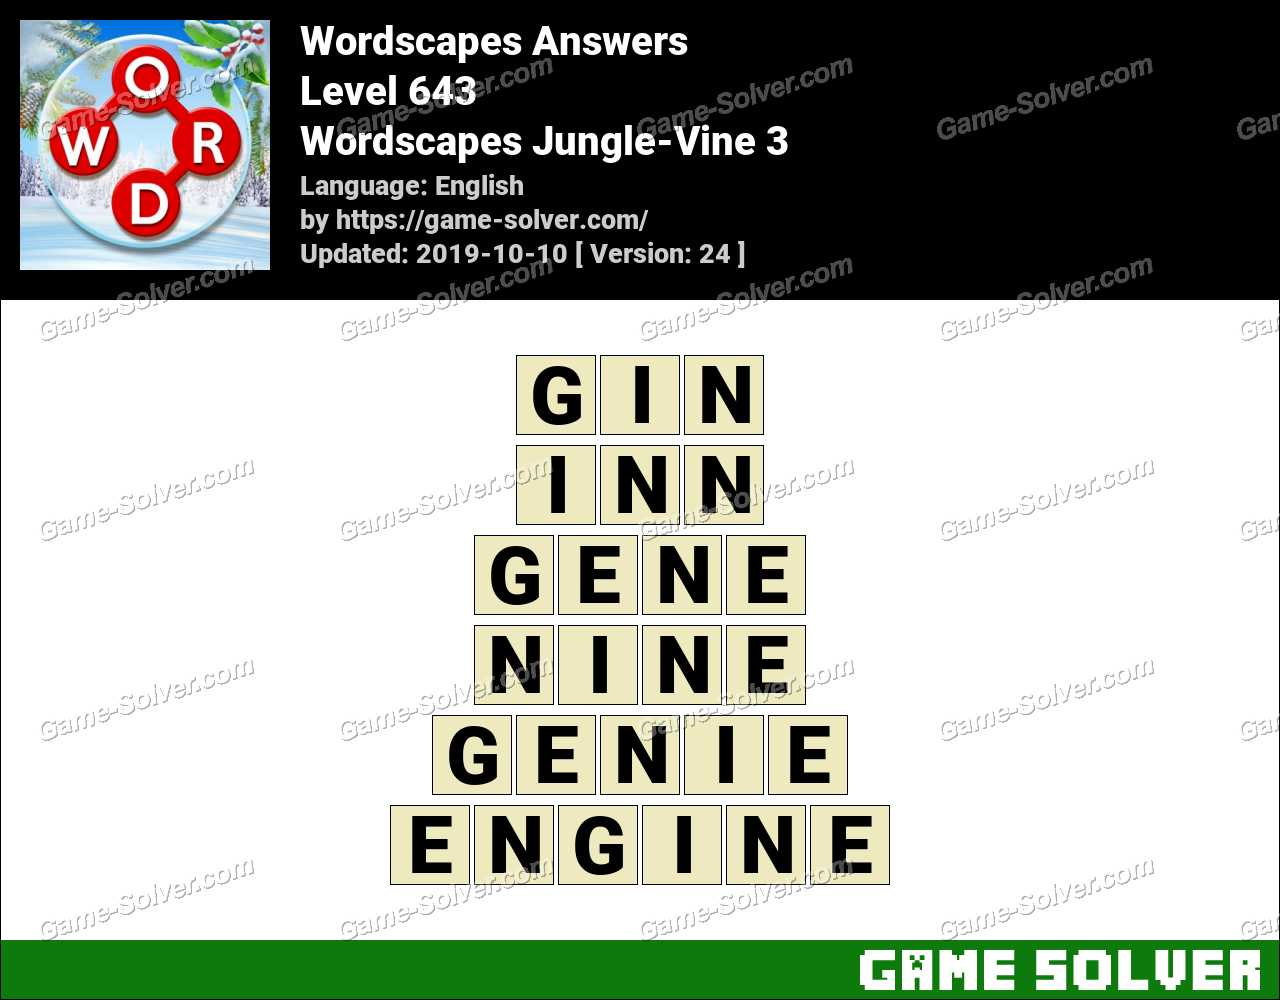 Wordscapes Jungle-Vine 3 Answers